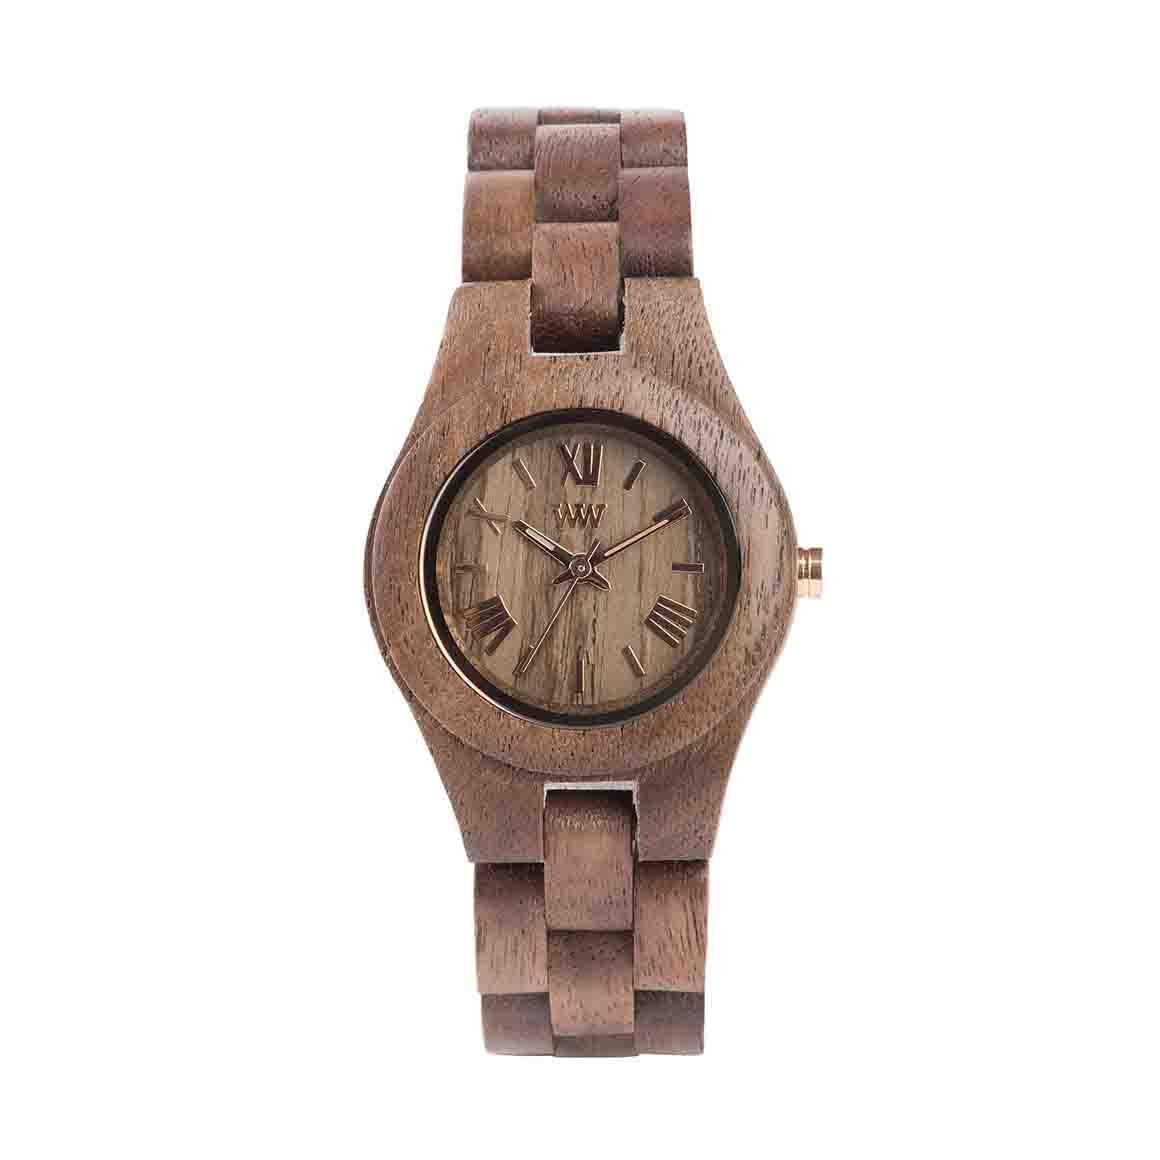 Criss Nut Wood Watch   Trada Marketplace